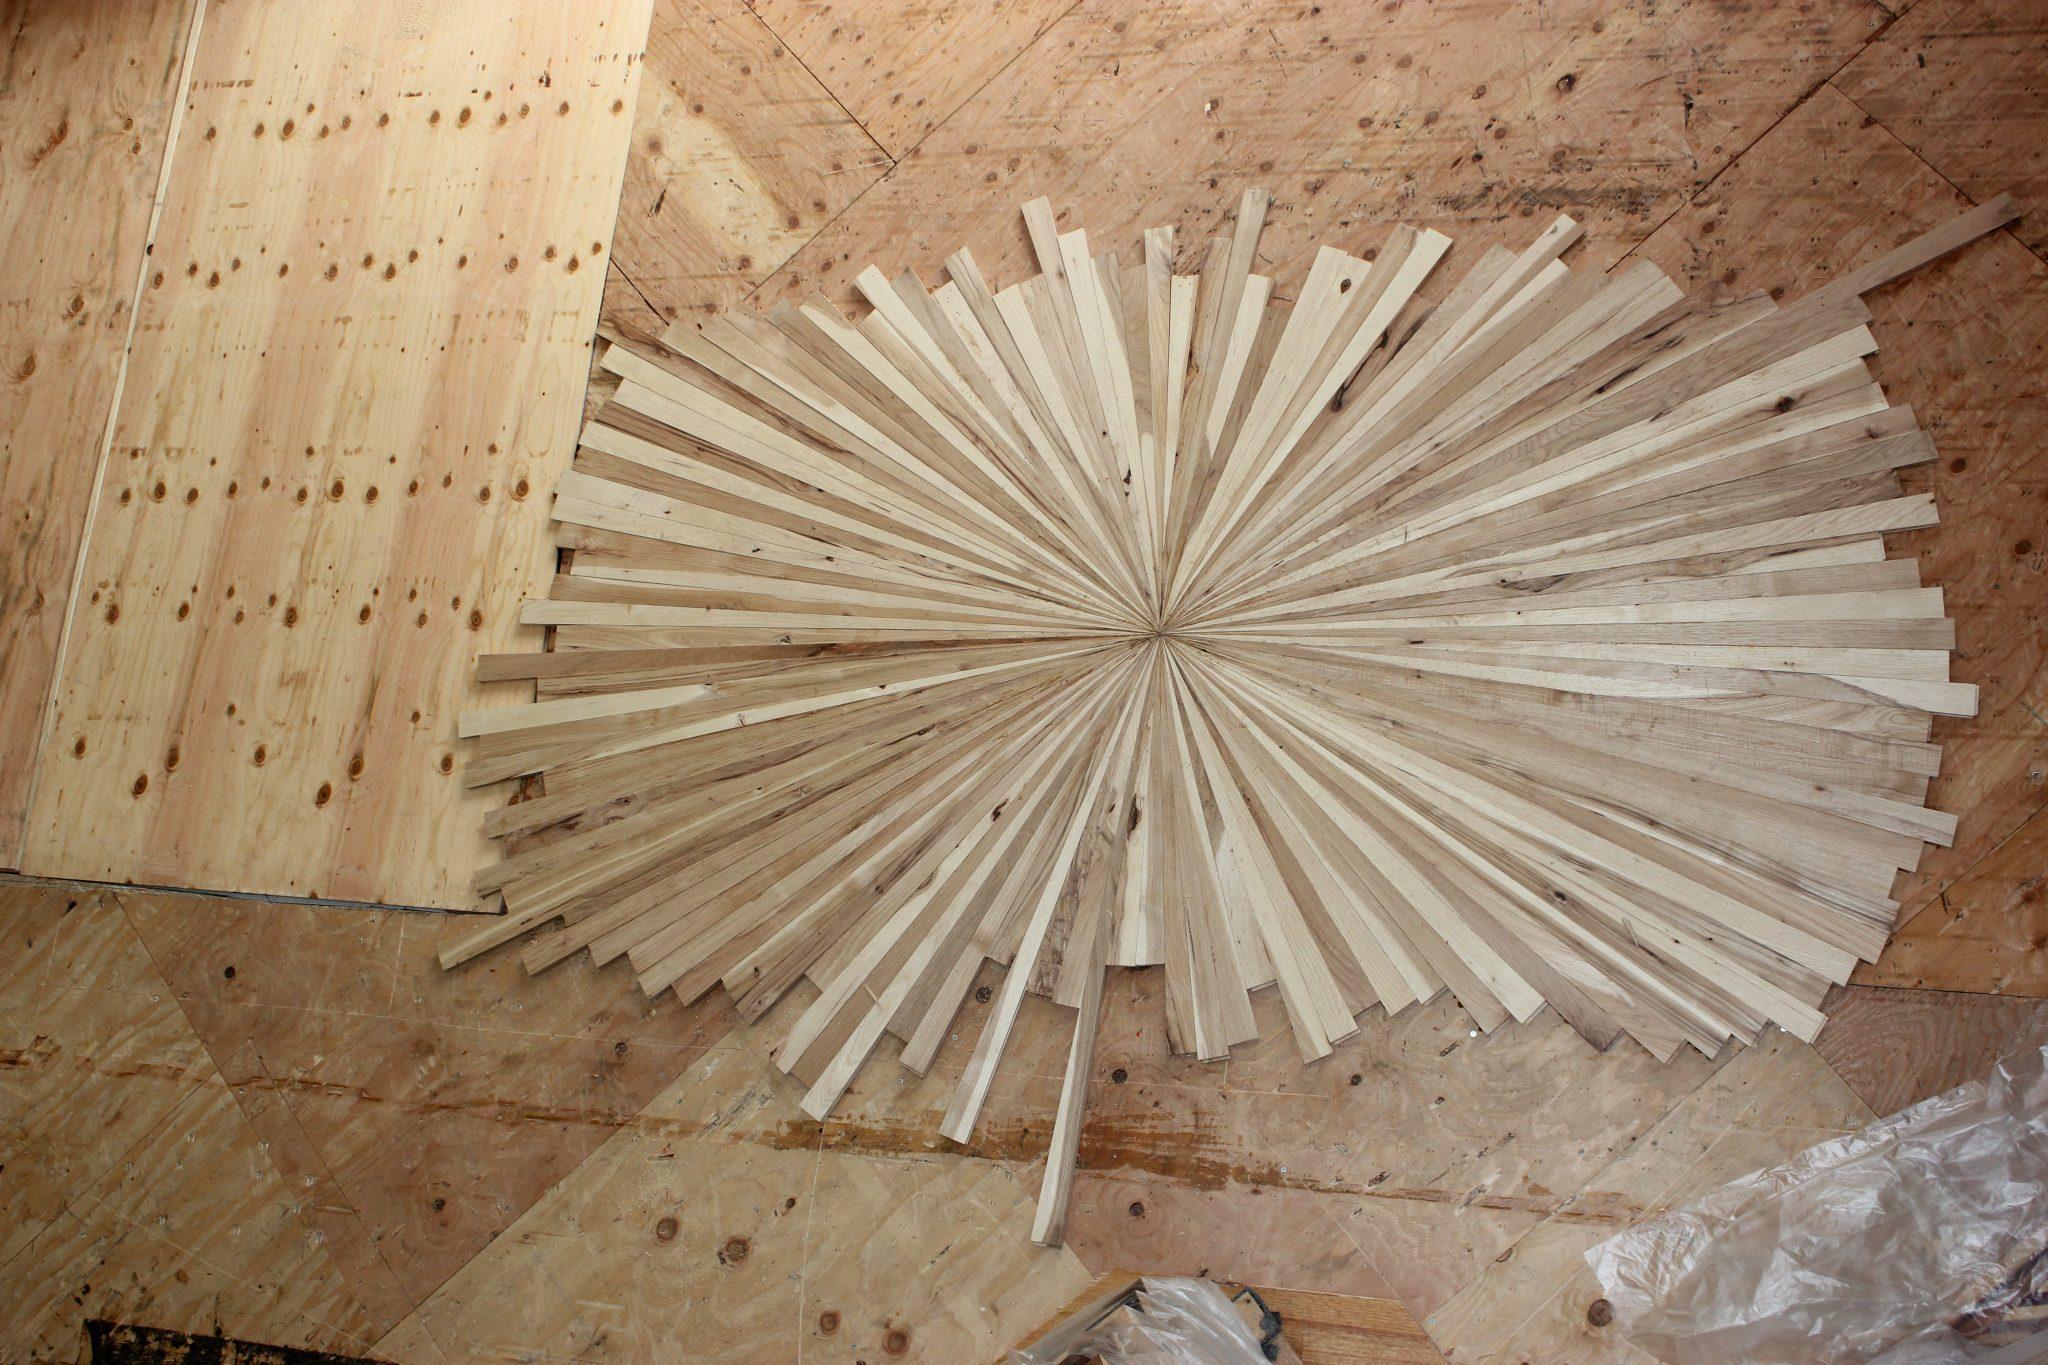 Arranging the starburst medallion pattern   Slaughterbeck Floors